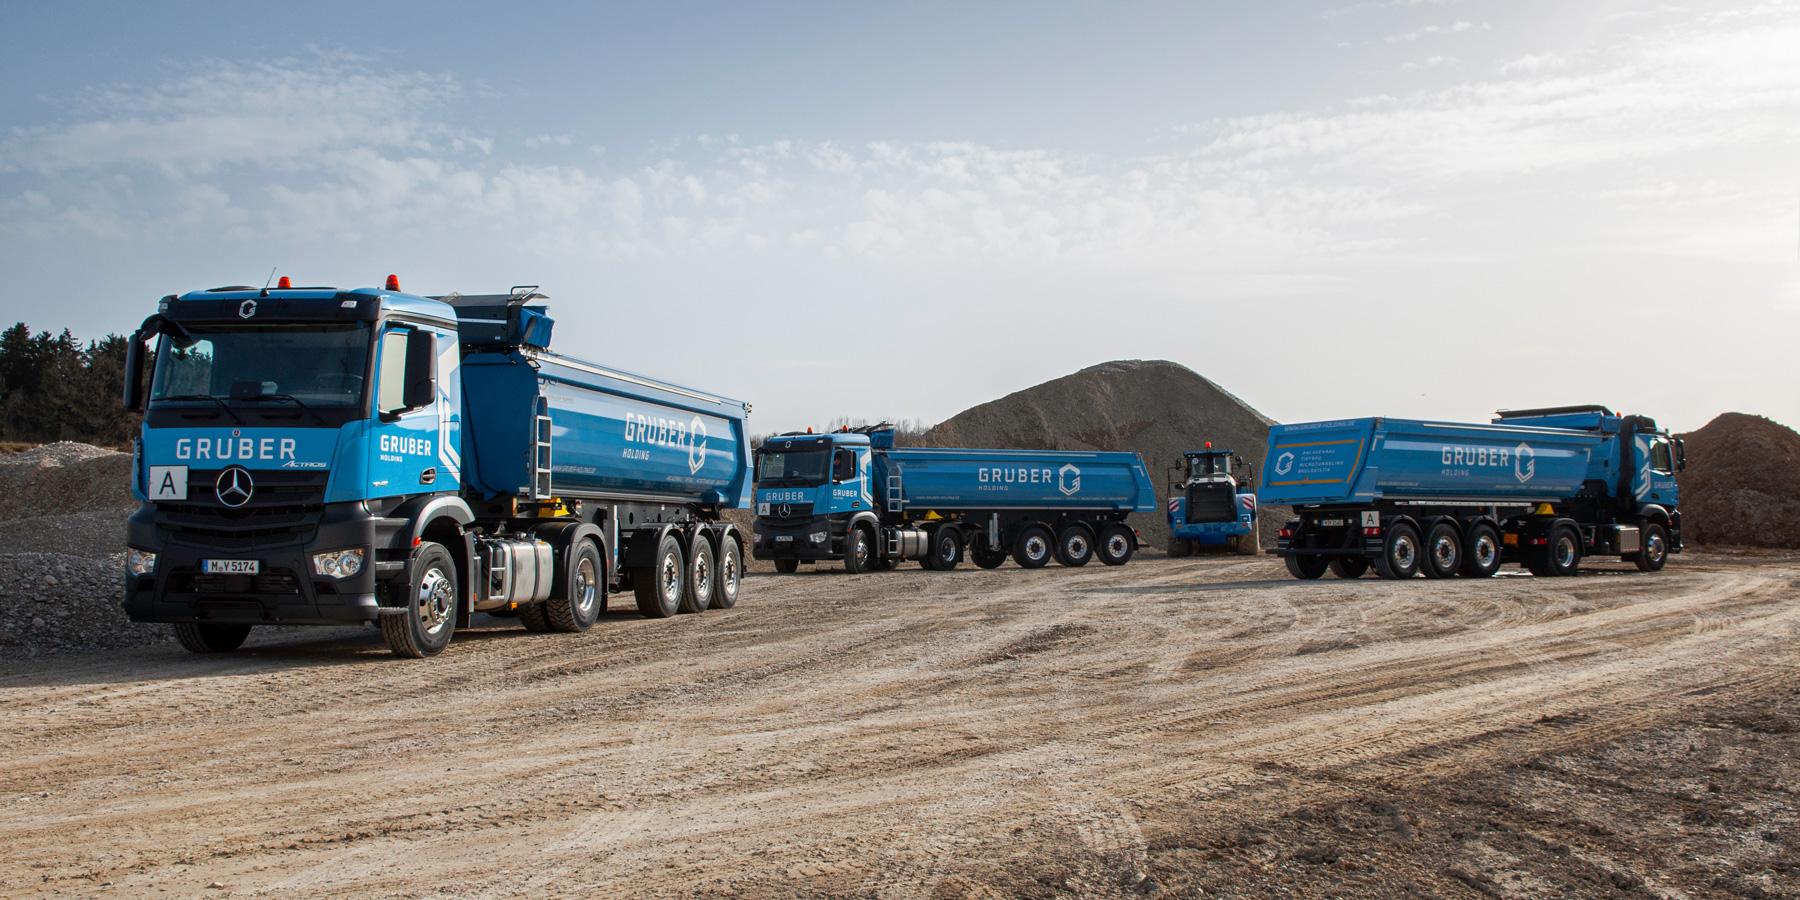 Kiesgrubenbetrieb Baulogistik - Gruber Holding, Sauerlach